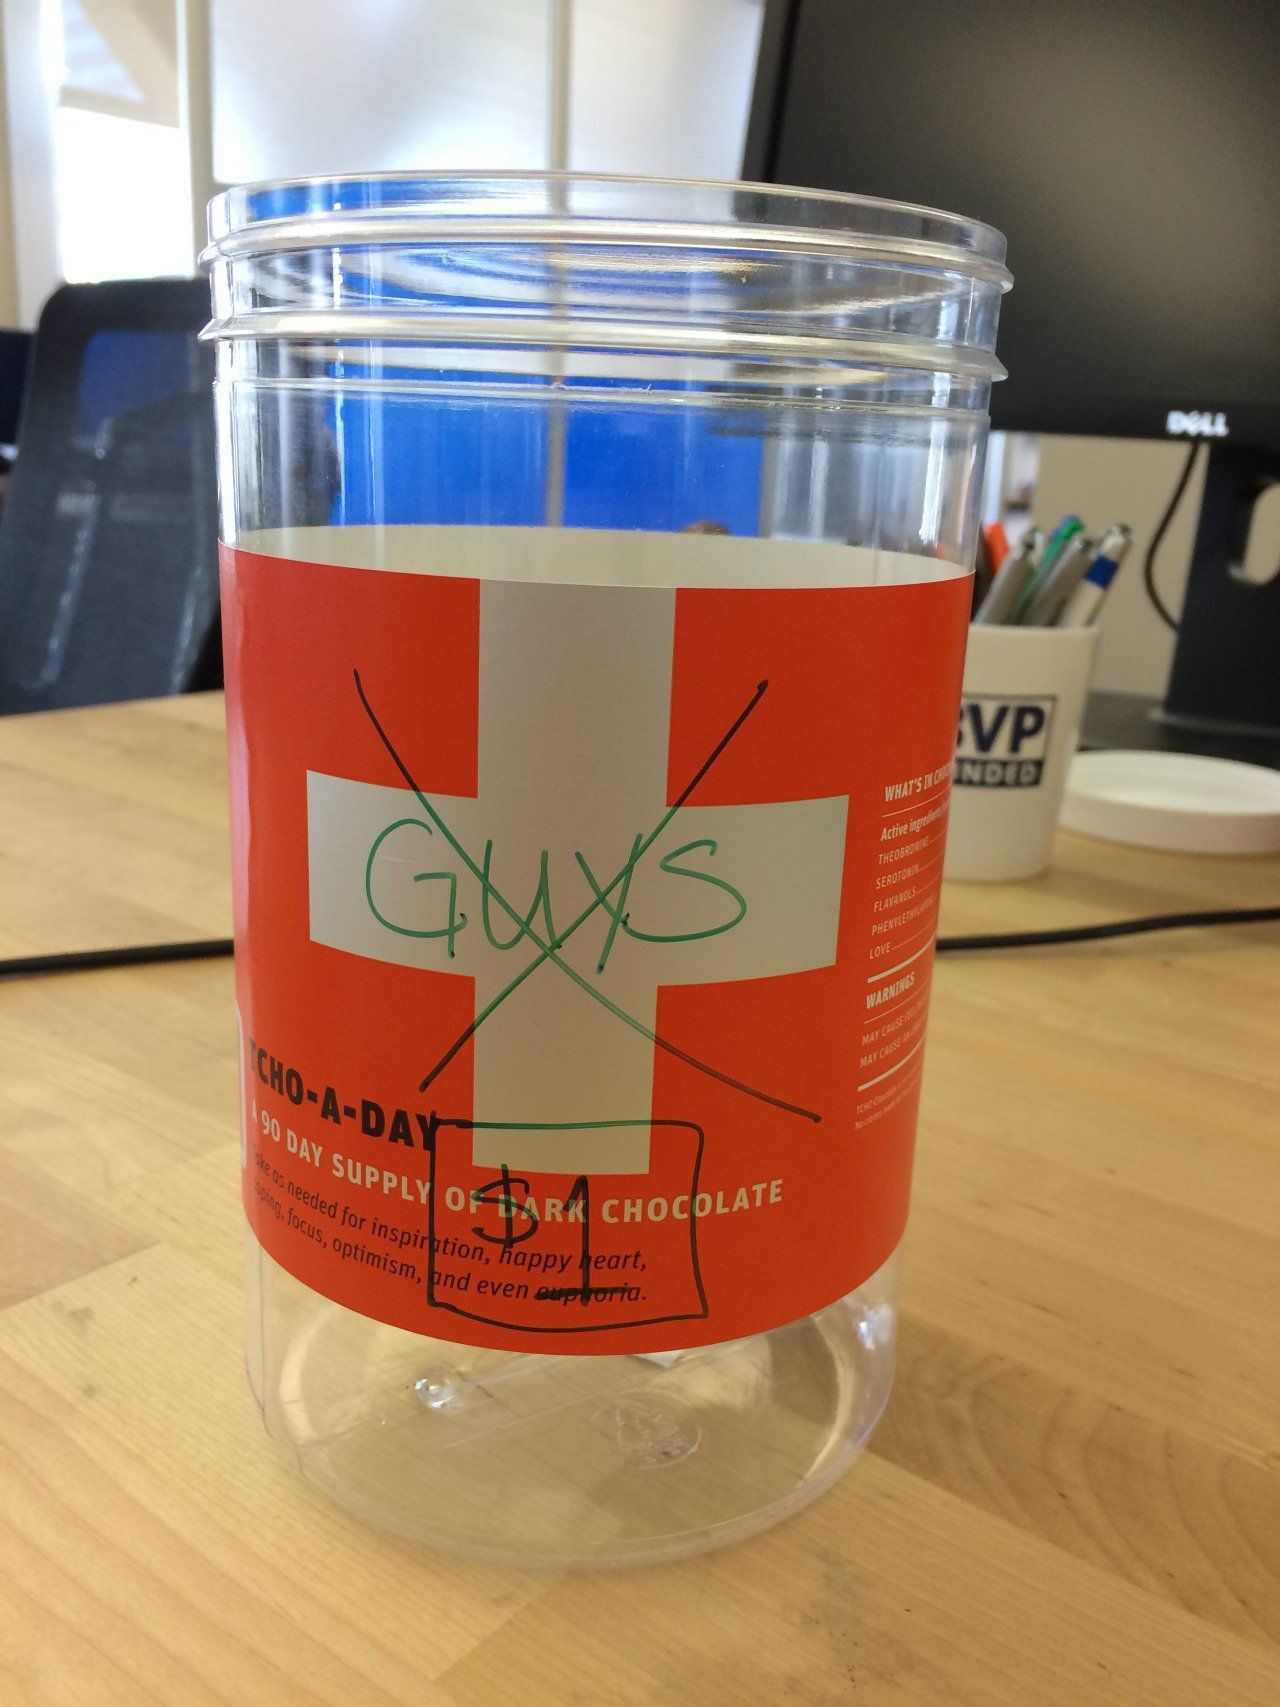 guys jar